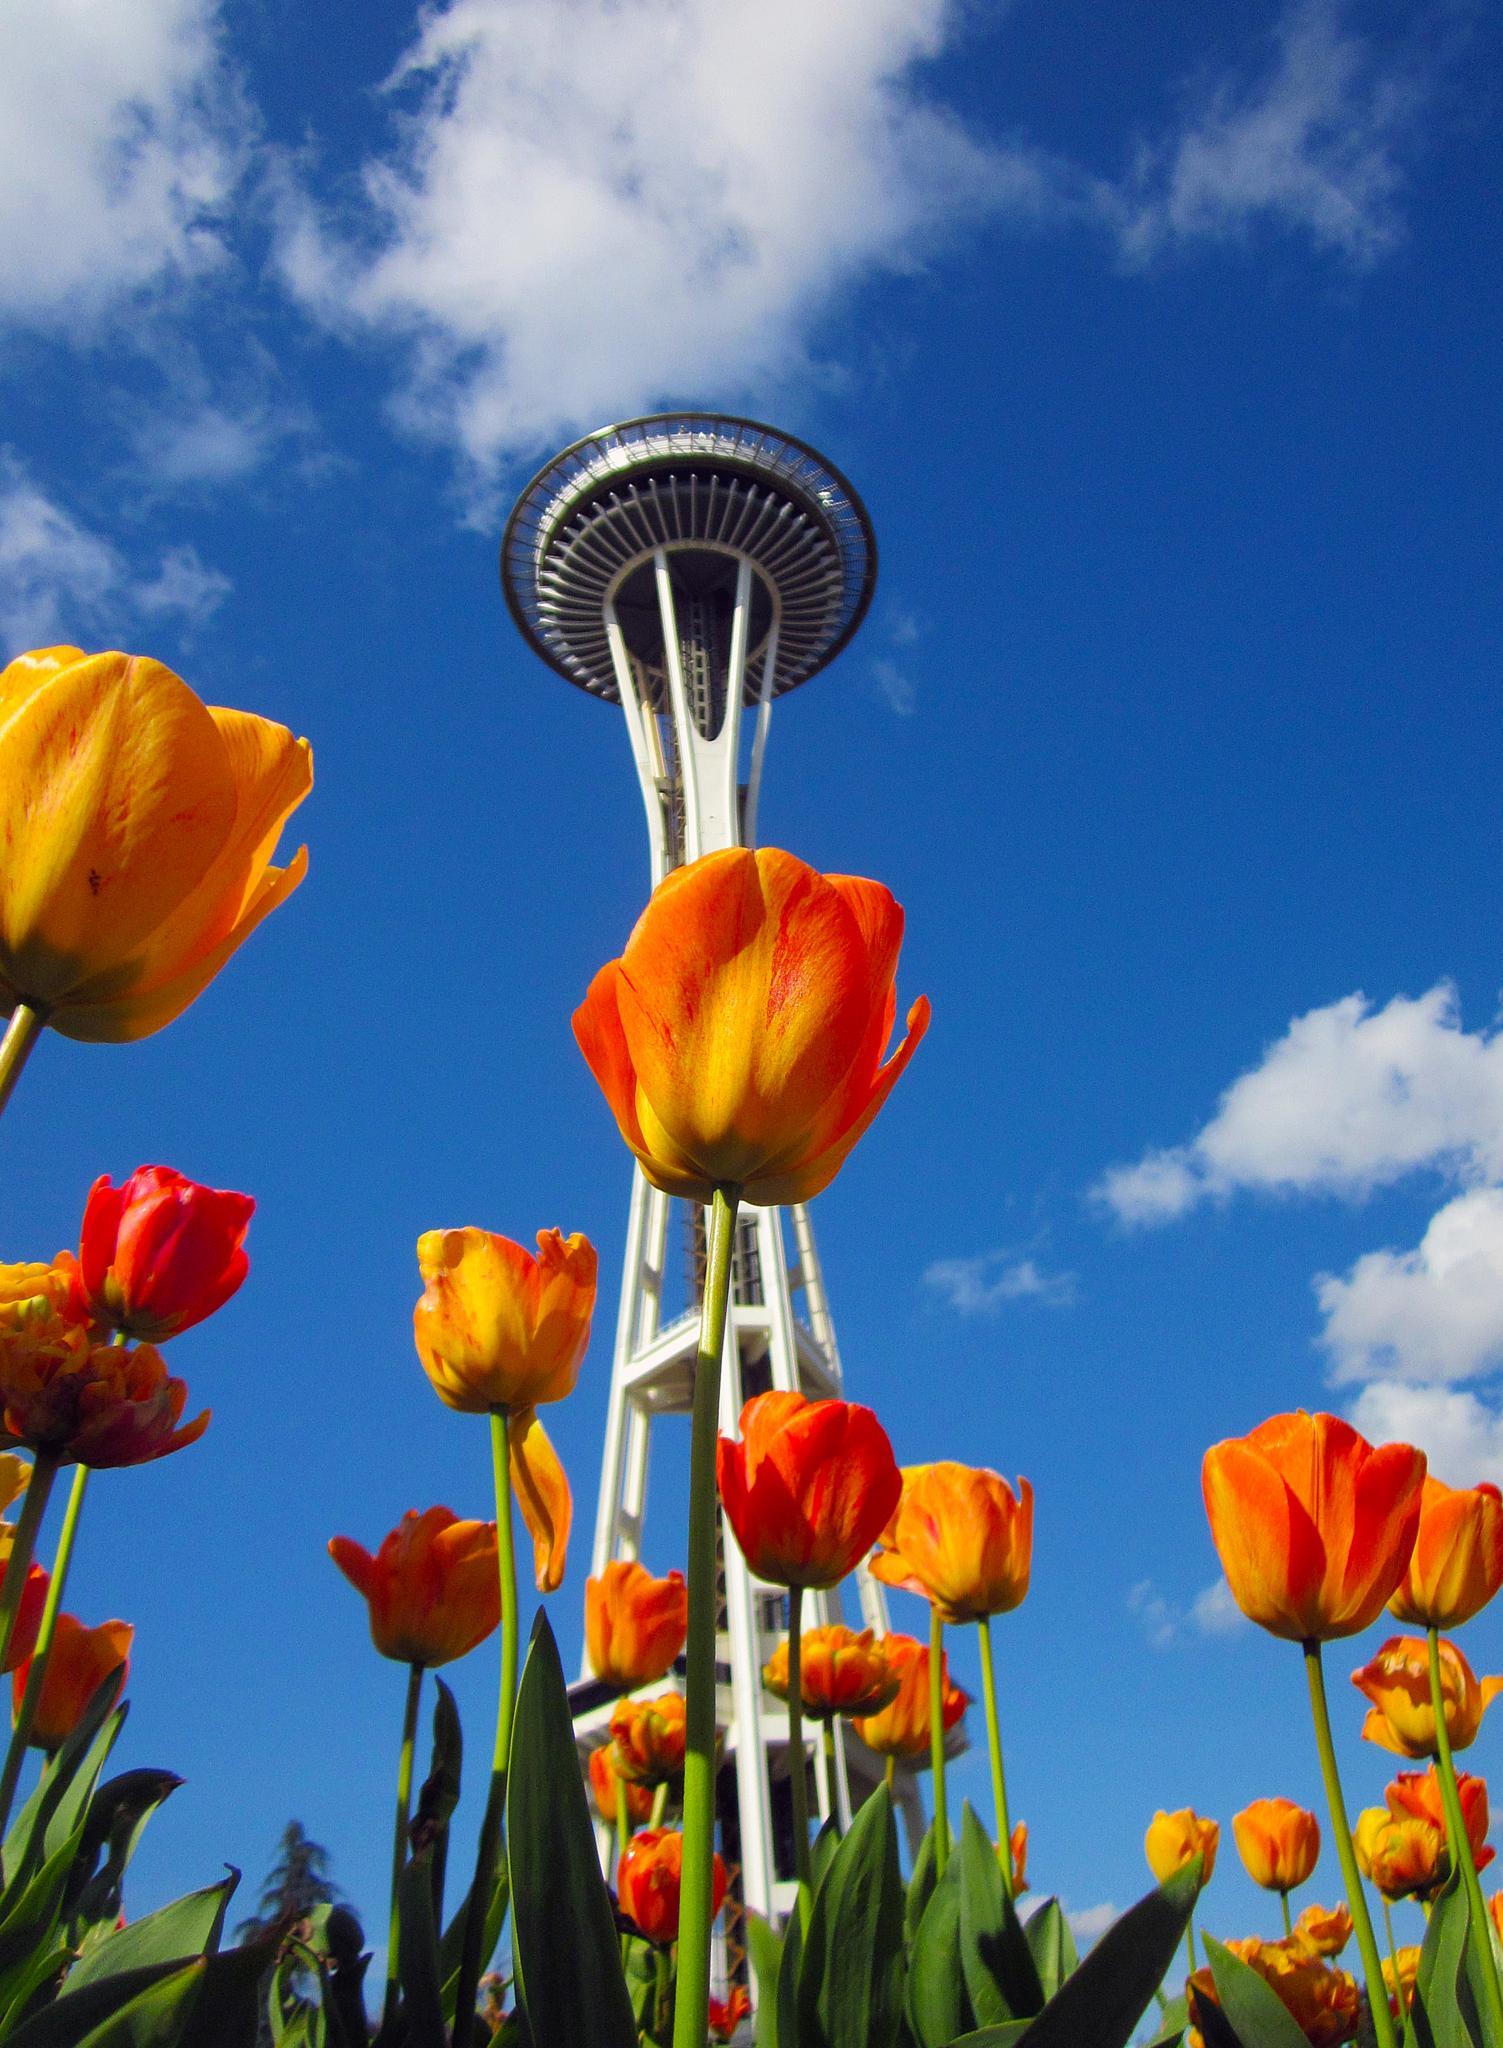 Seattle by Matthew Robinson